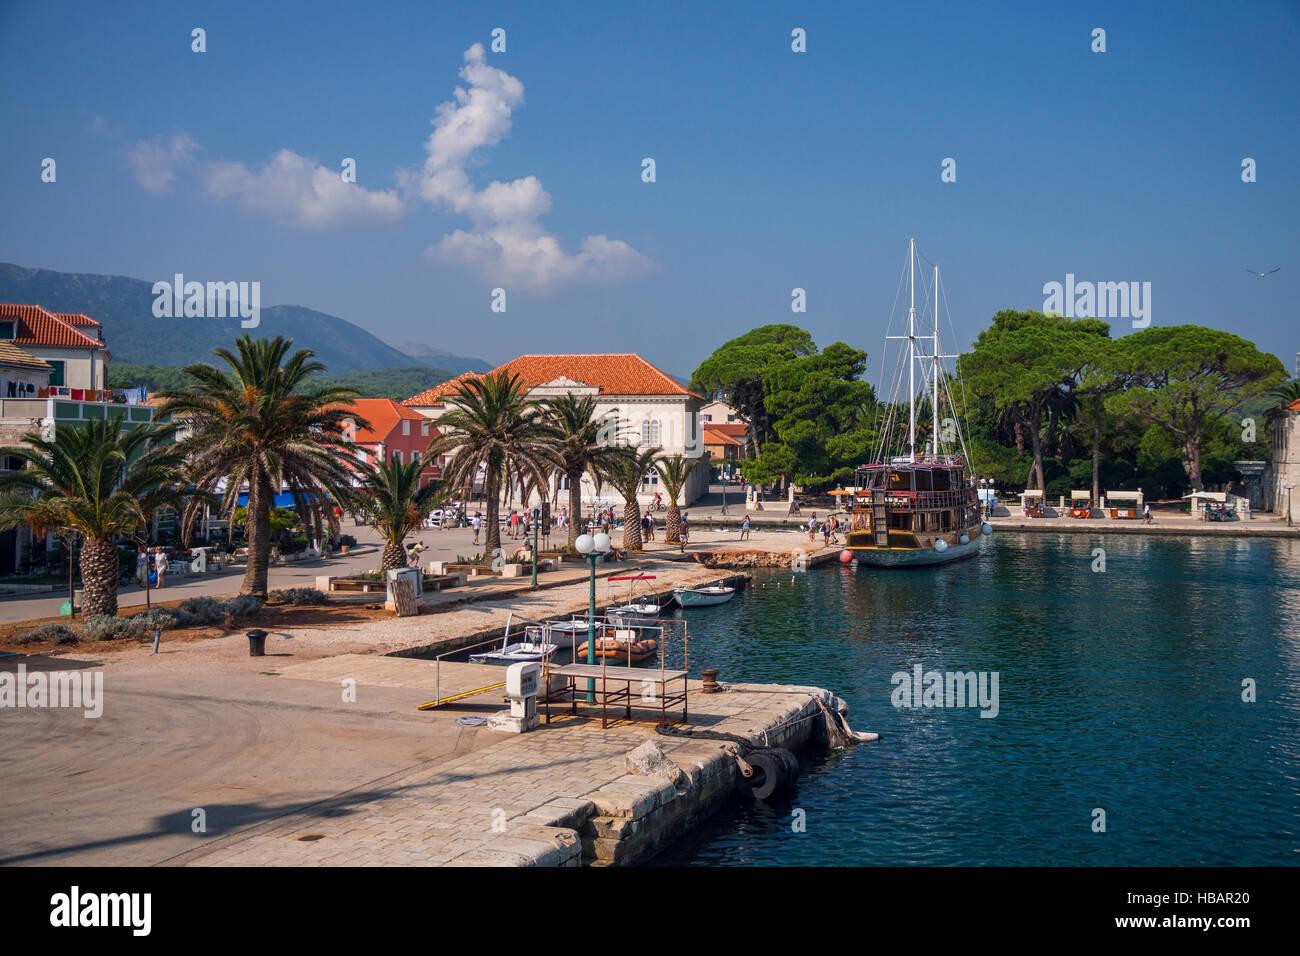 Jelsa, Makarska Riviera, Croatia - Stock Image